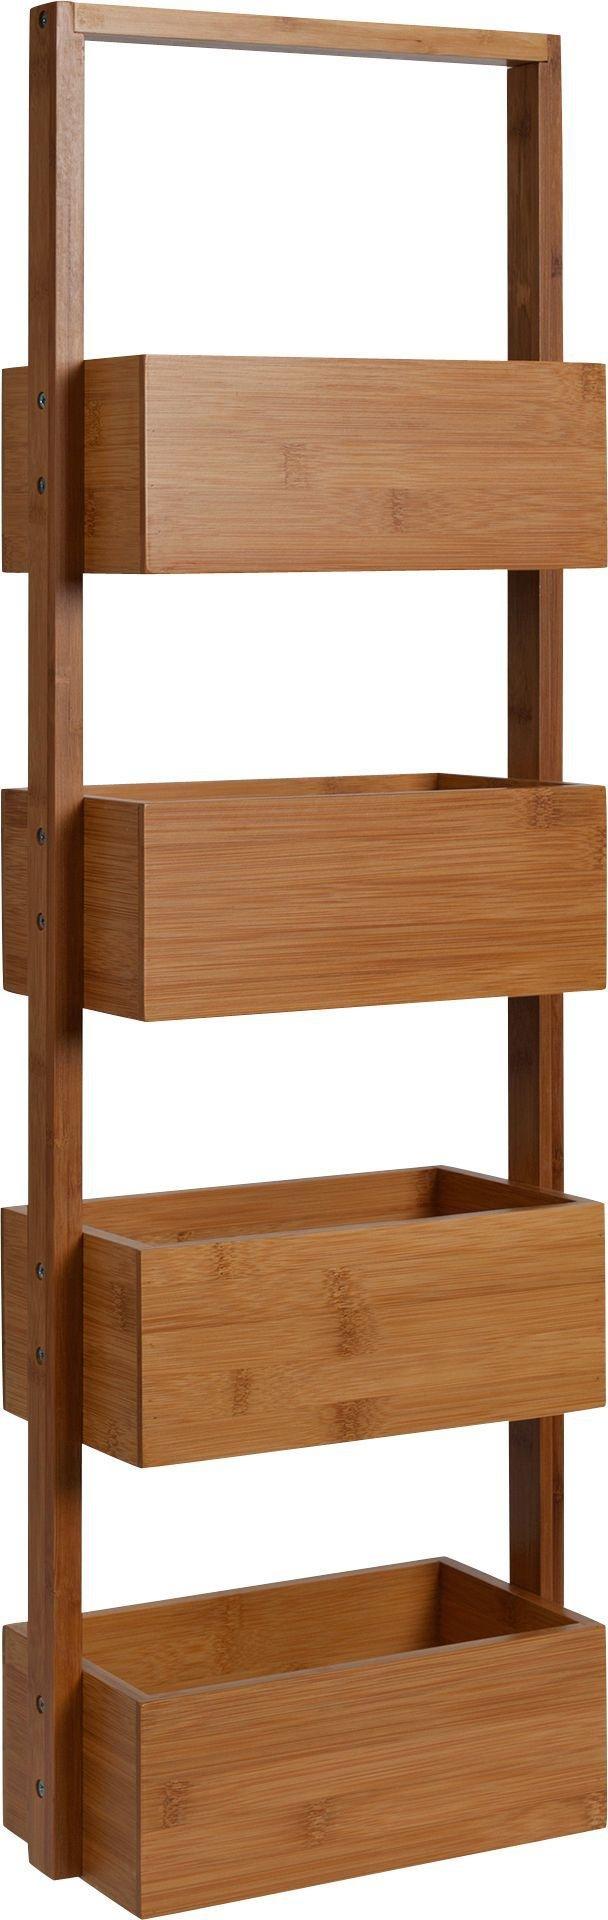 buy collection bamboo bathroom storage caddy at argos